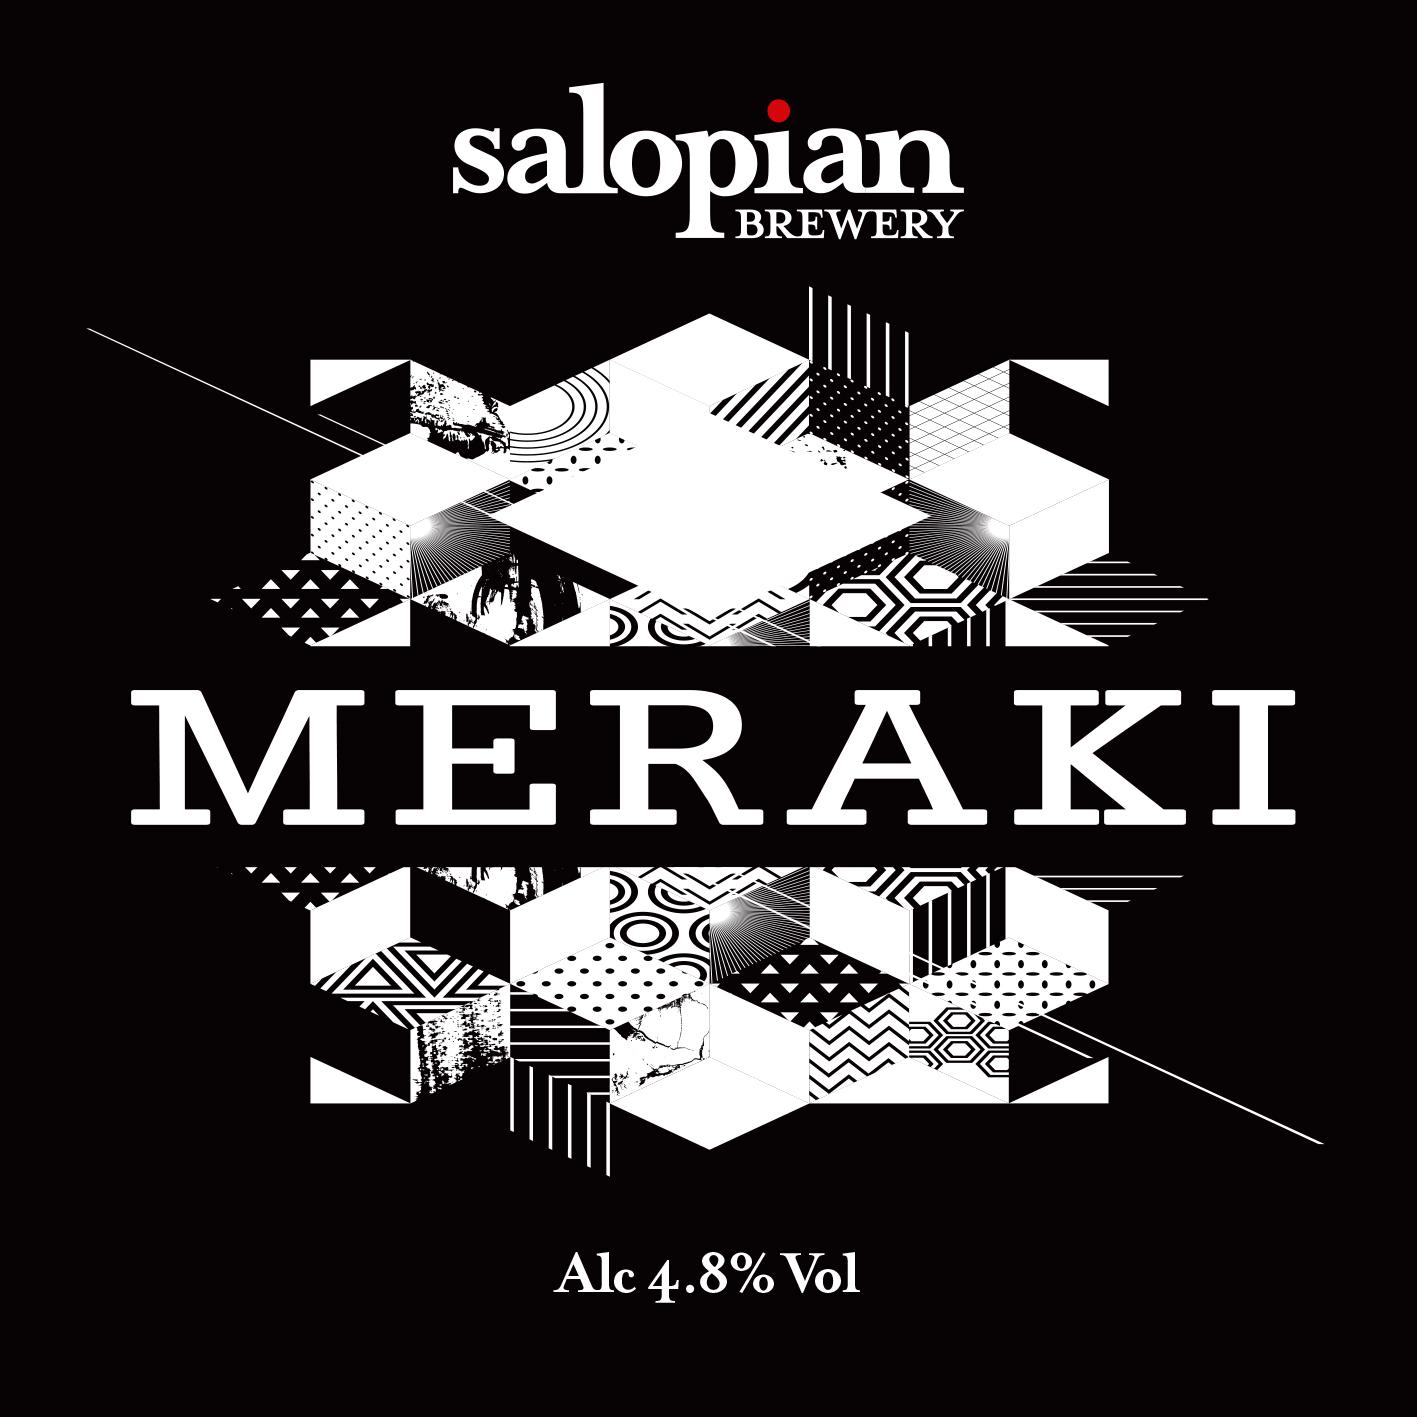 Salopian Meraki Chocolate&Vanilla Stout 9 Gallons Dark 4.8%